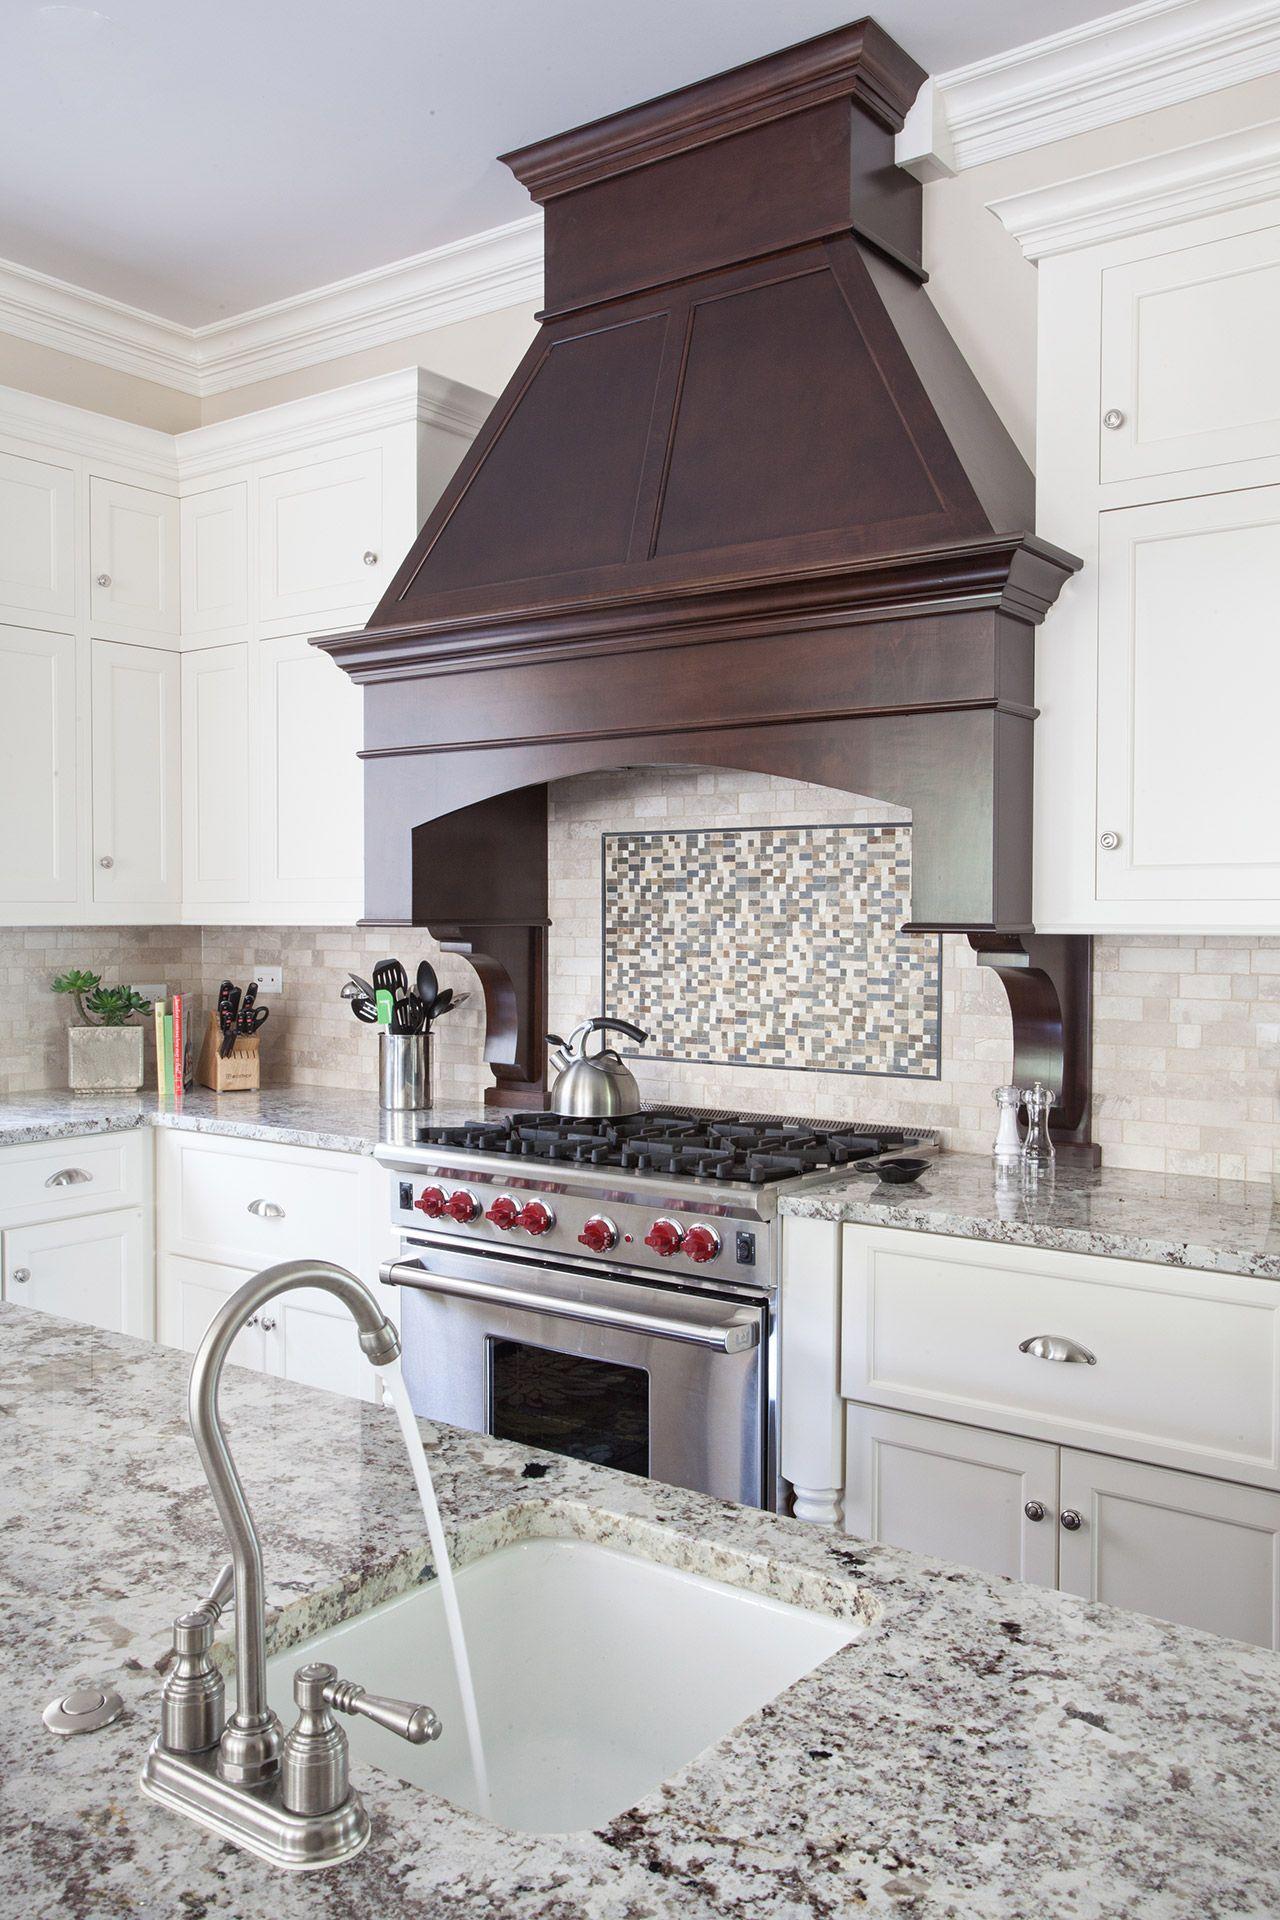 Wooden wood custom millwork stove hood Kitchen hood design